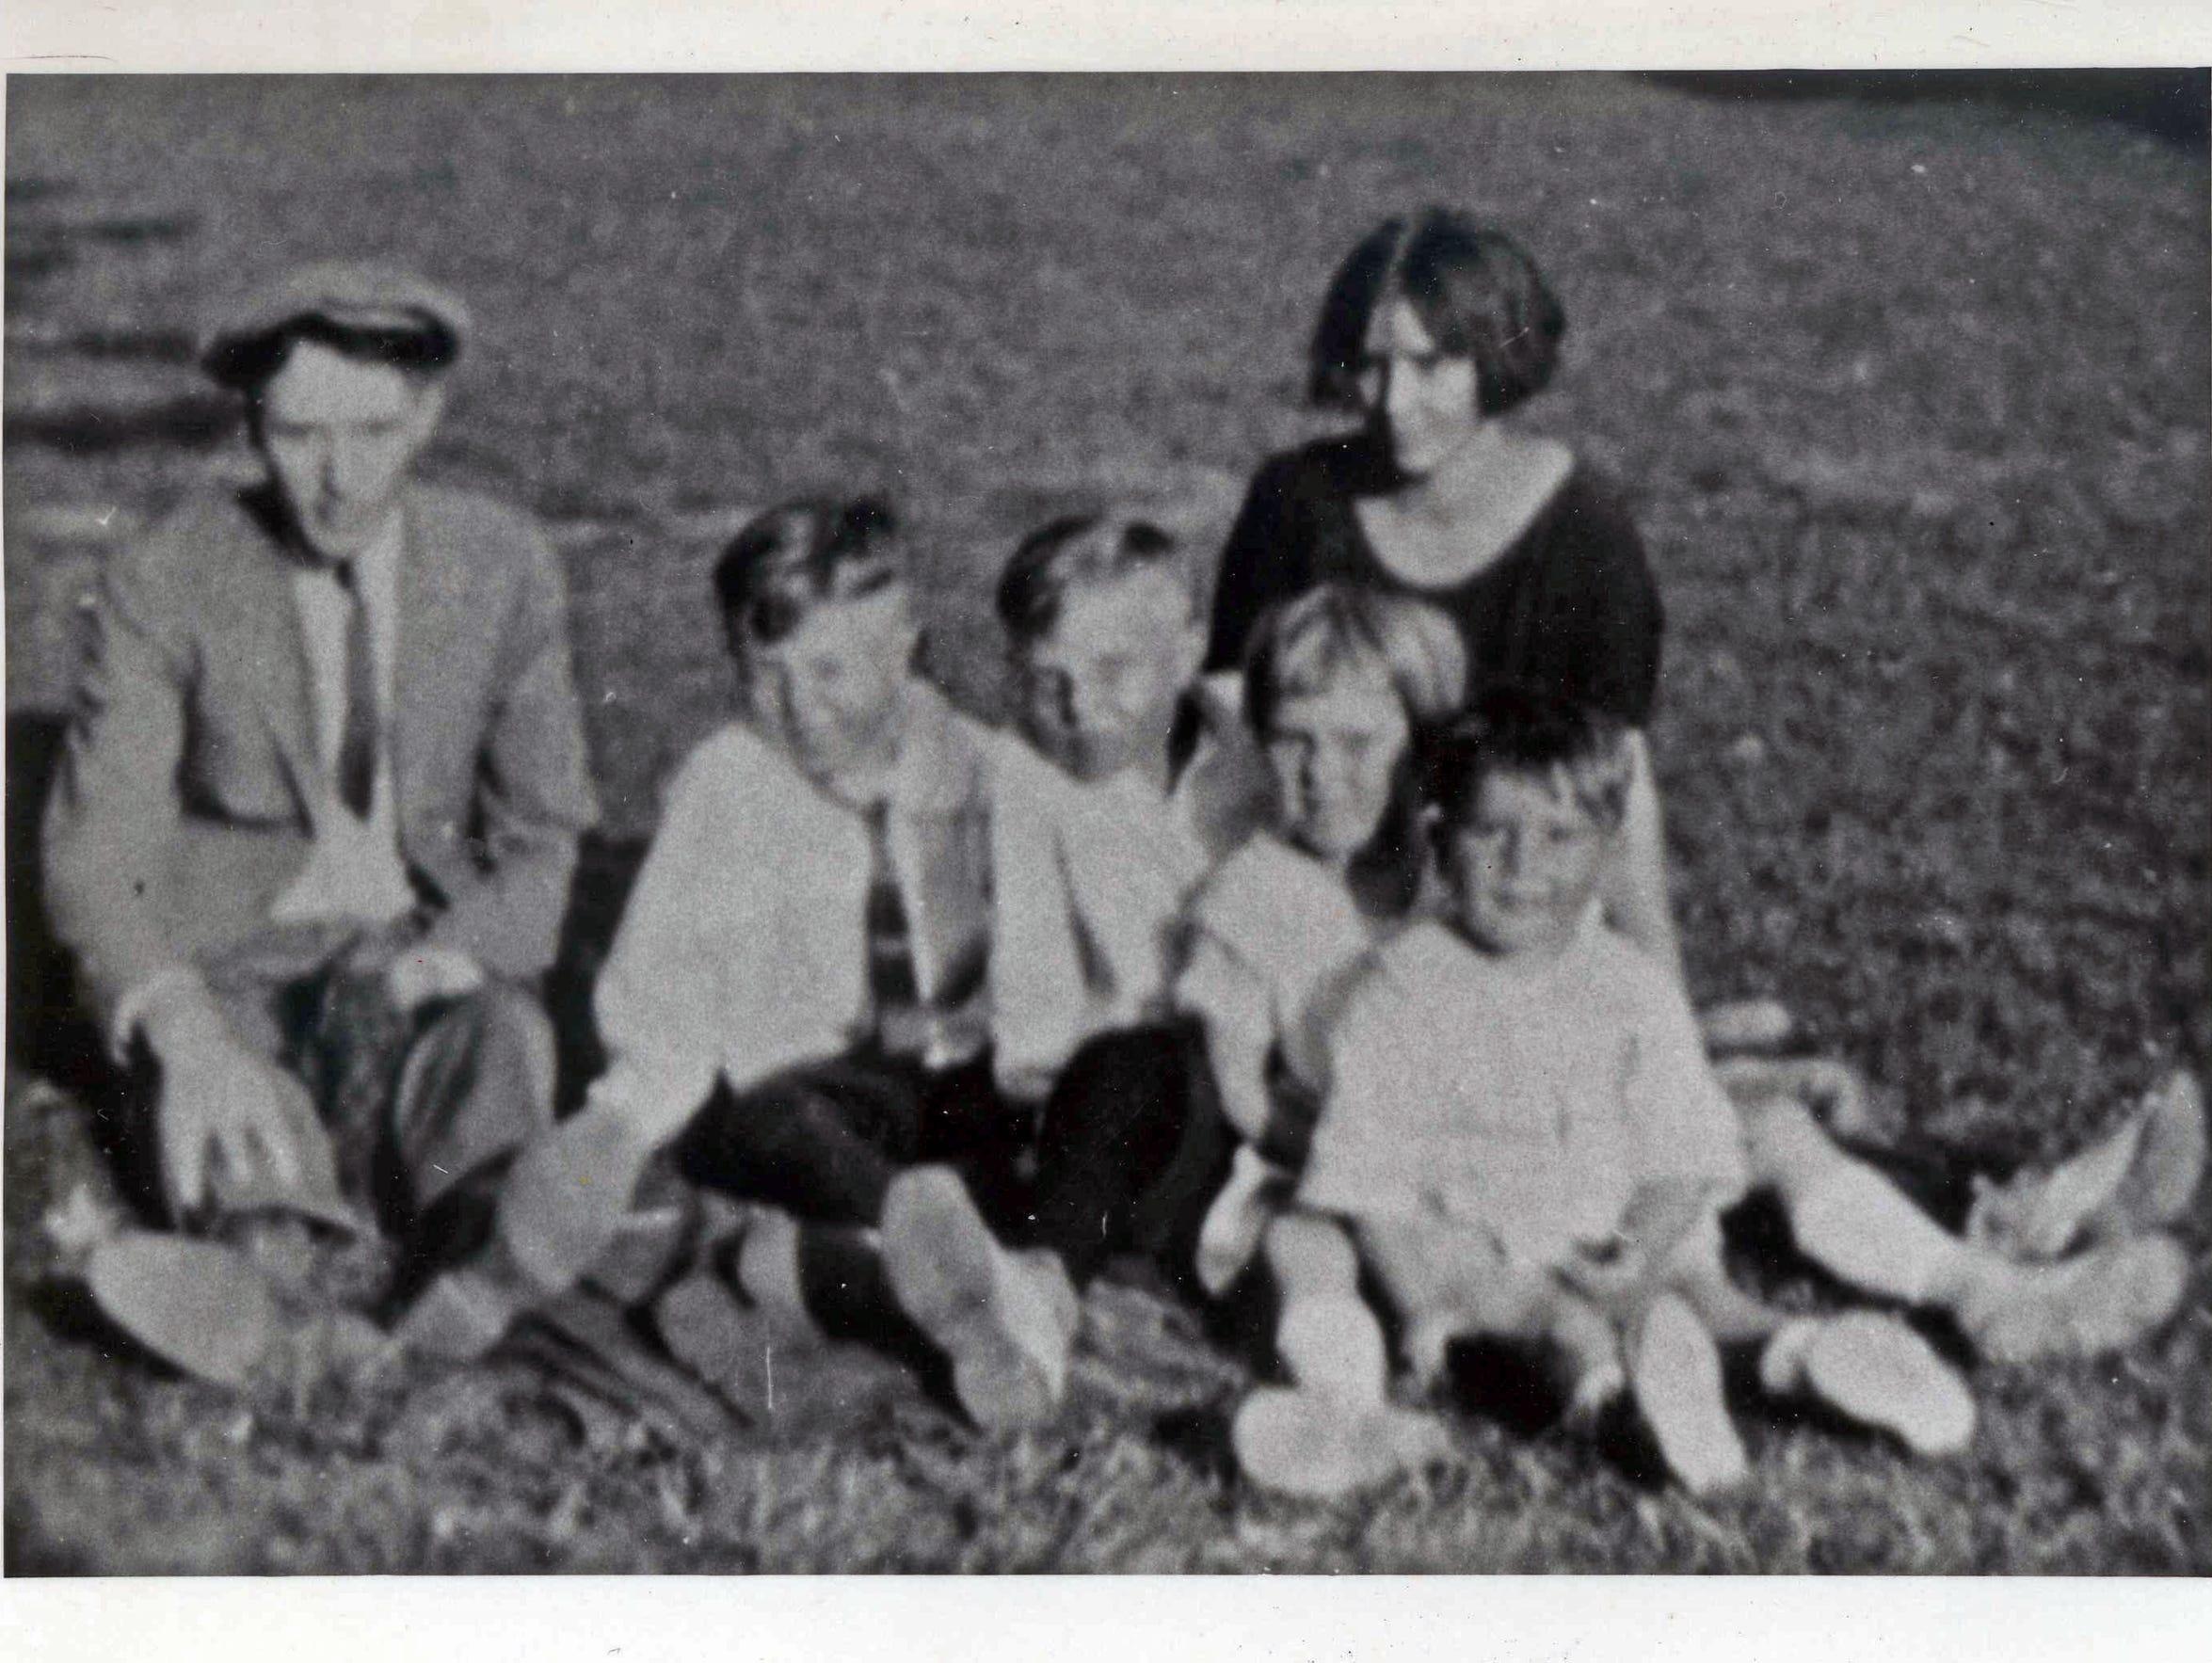 From left, William, Maurice, Donald, Mary, Bernard